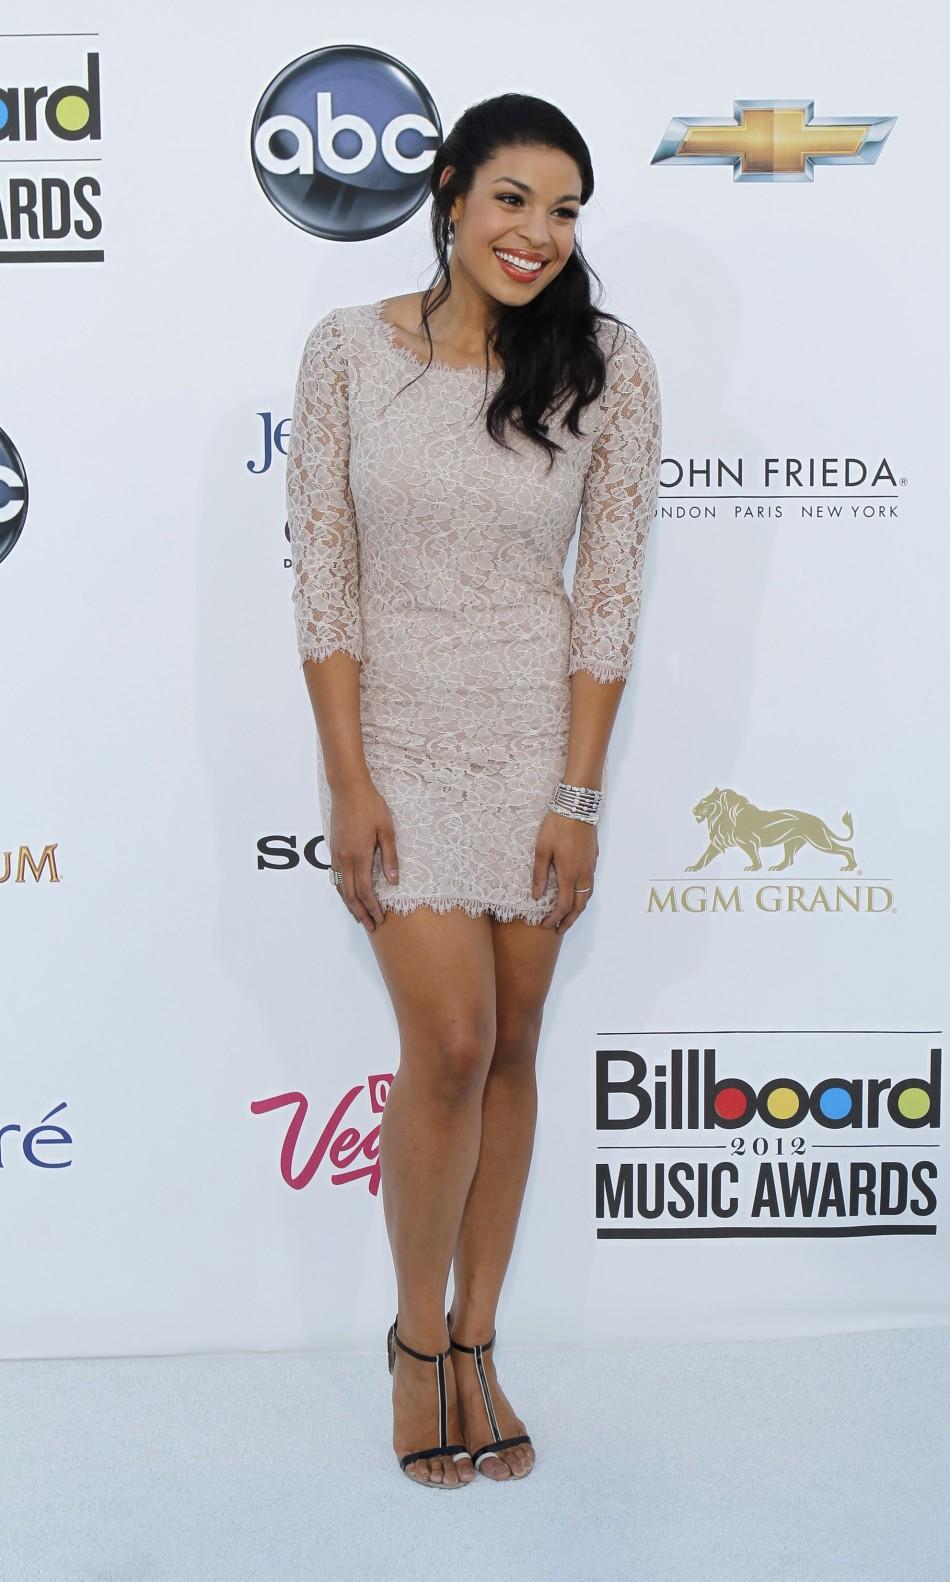 Billboard Music Awards 2012 Best Dressed